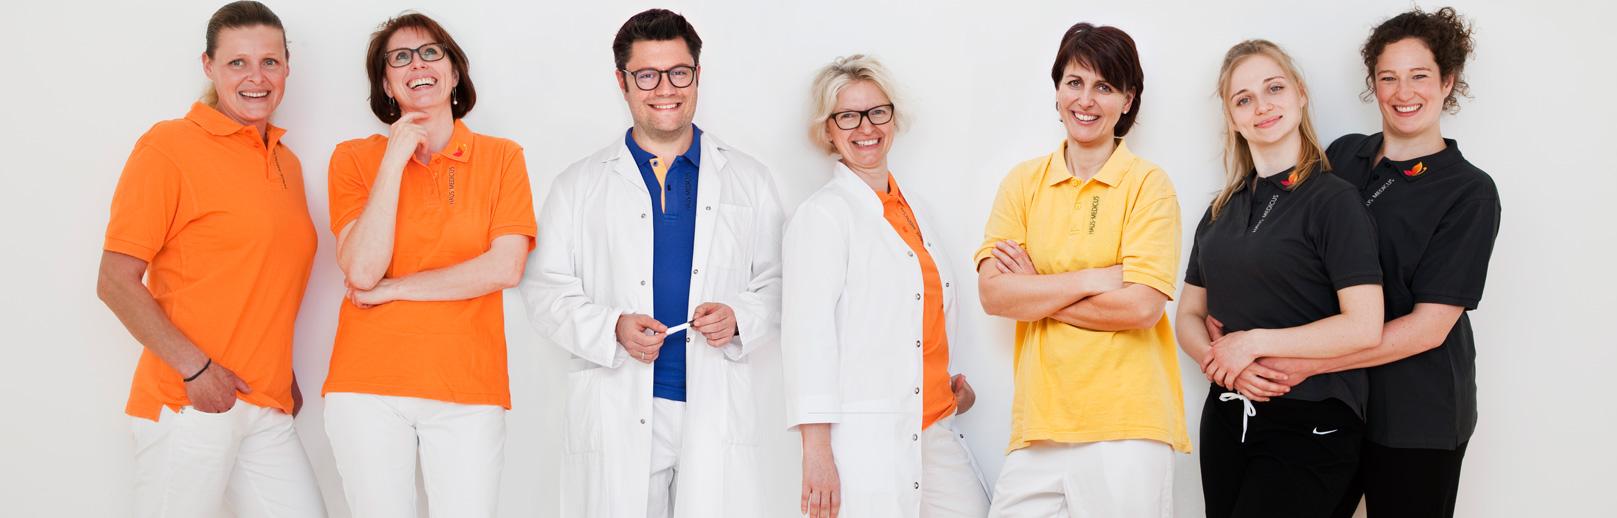 das team der praxisgemeinschaft haus medicus